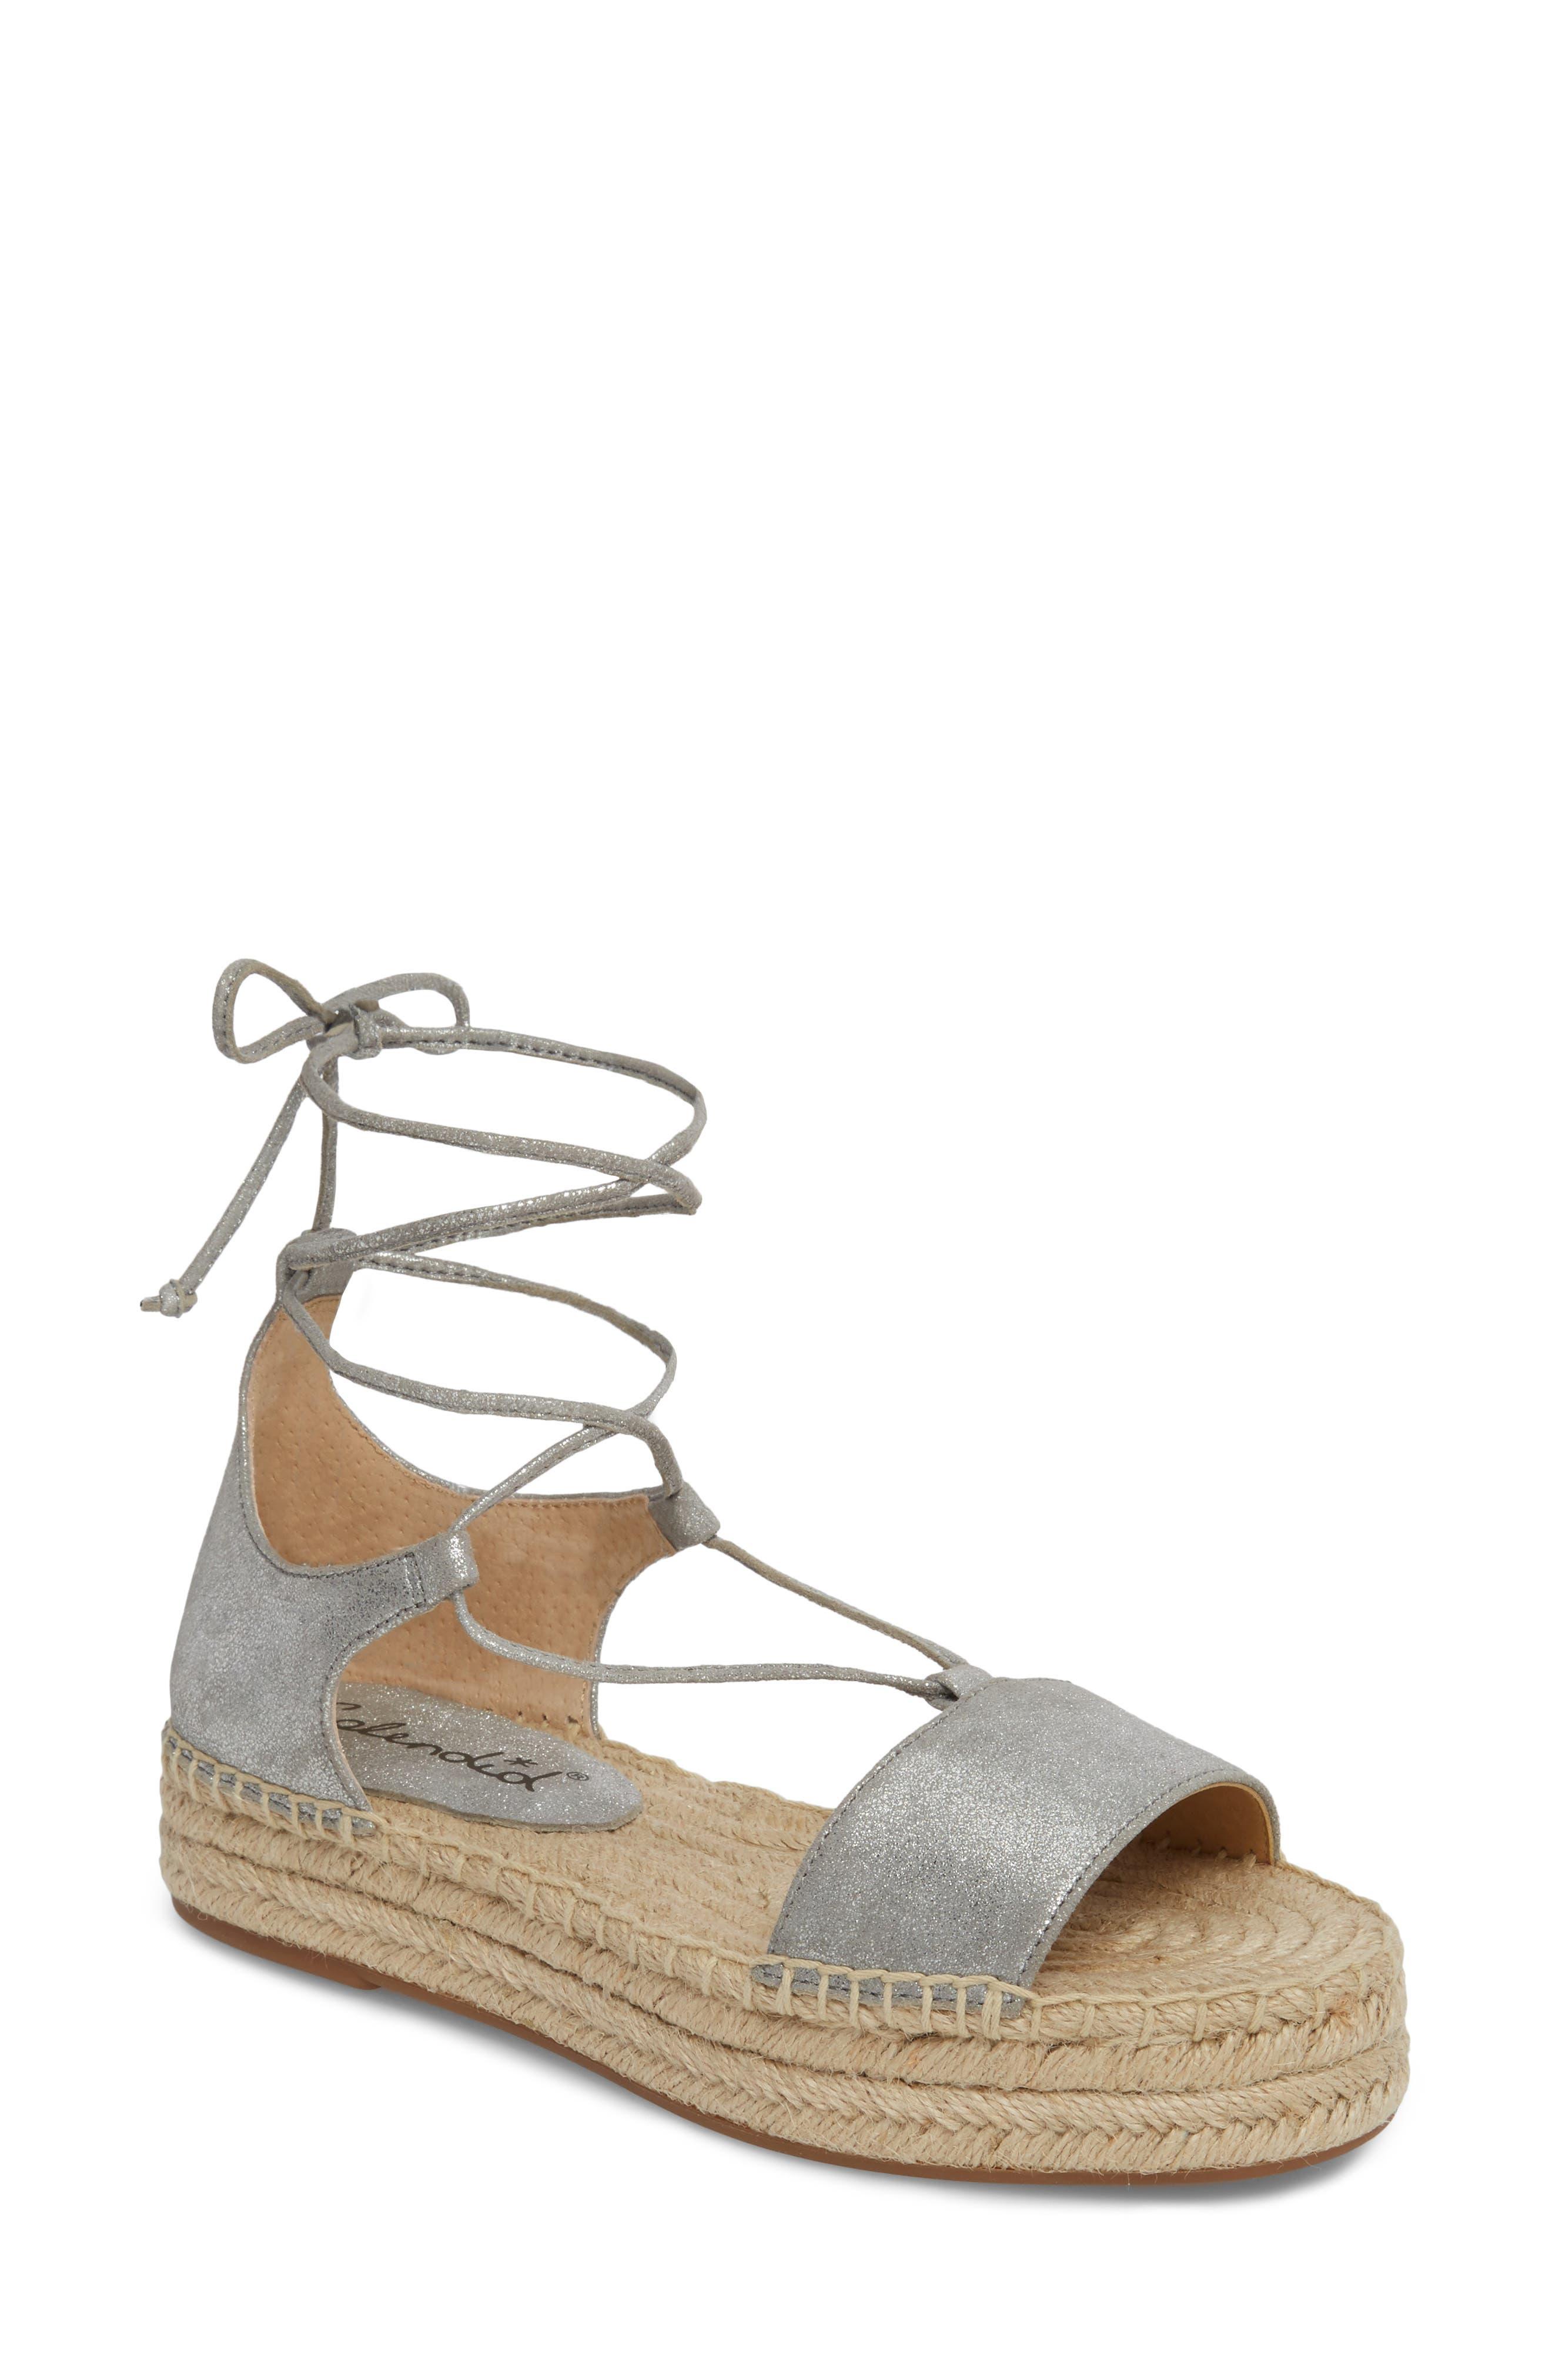 Splendid Fernanda Wraparound Platform Sandal- Metallic